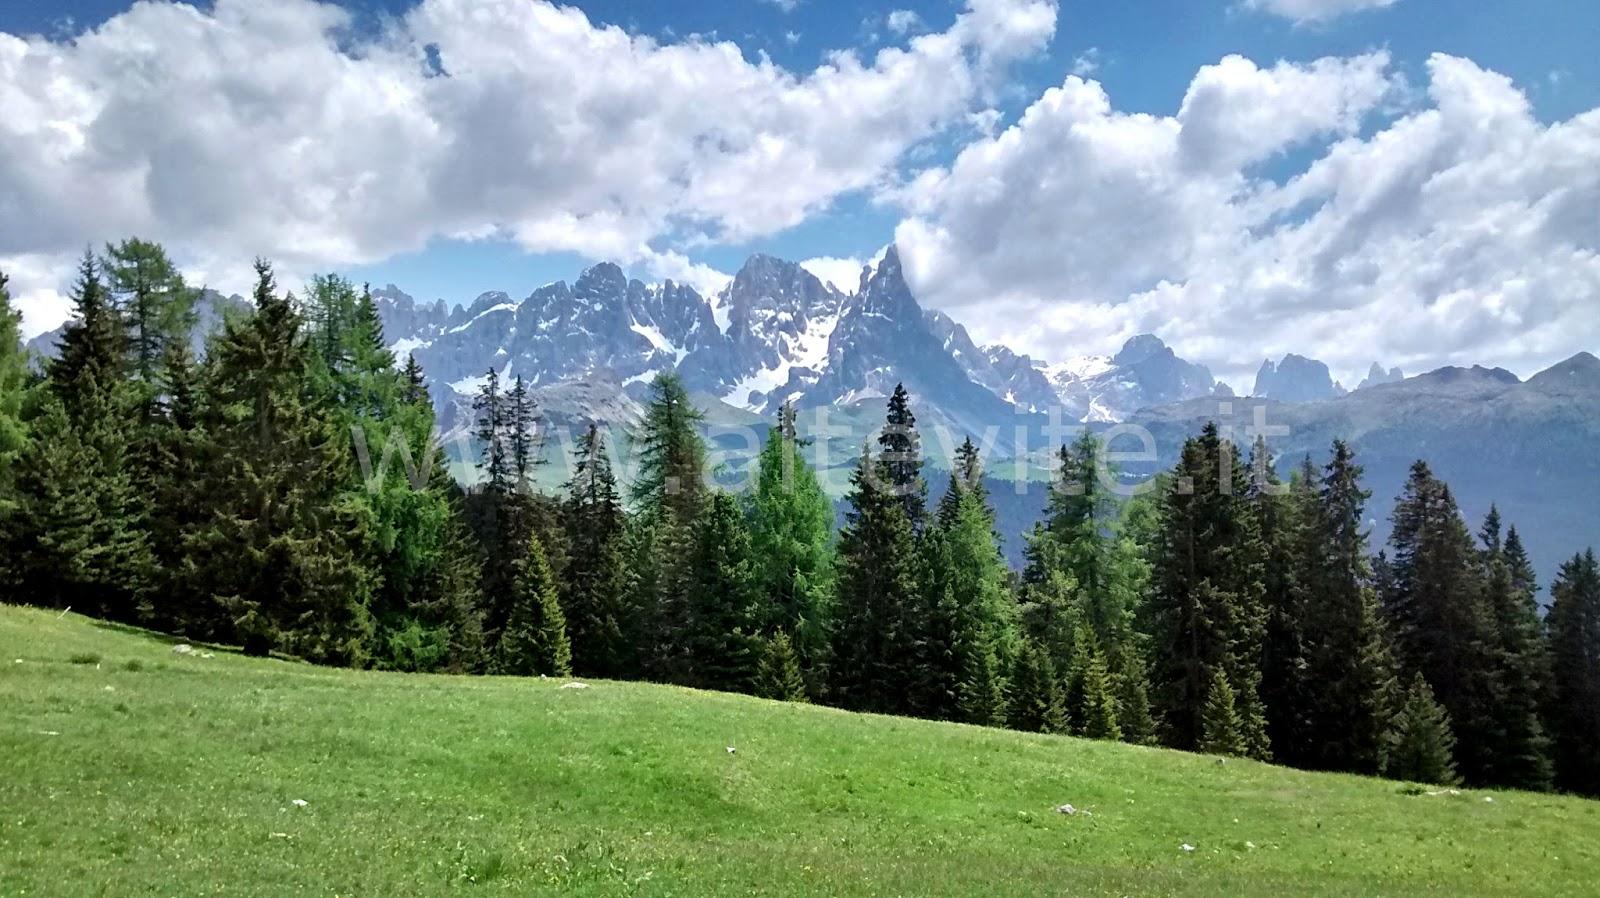 Vacanze in montagna altevite for Vacanze in montagna